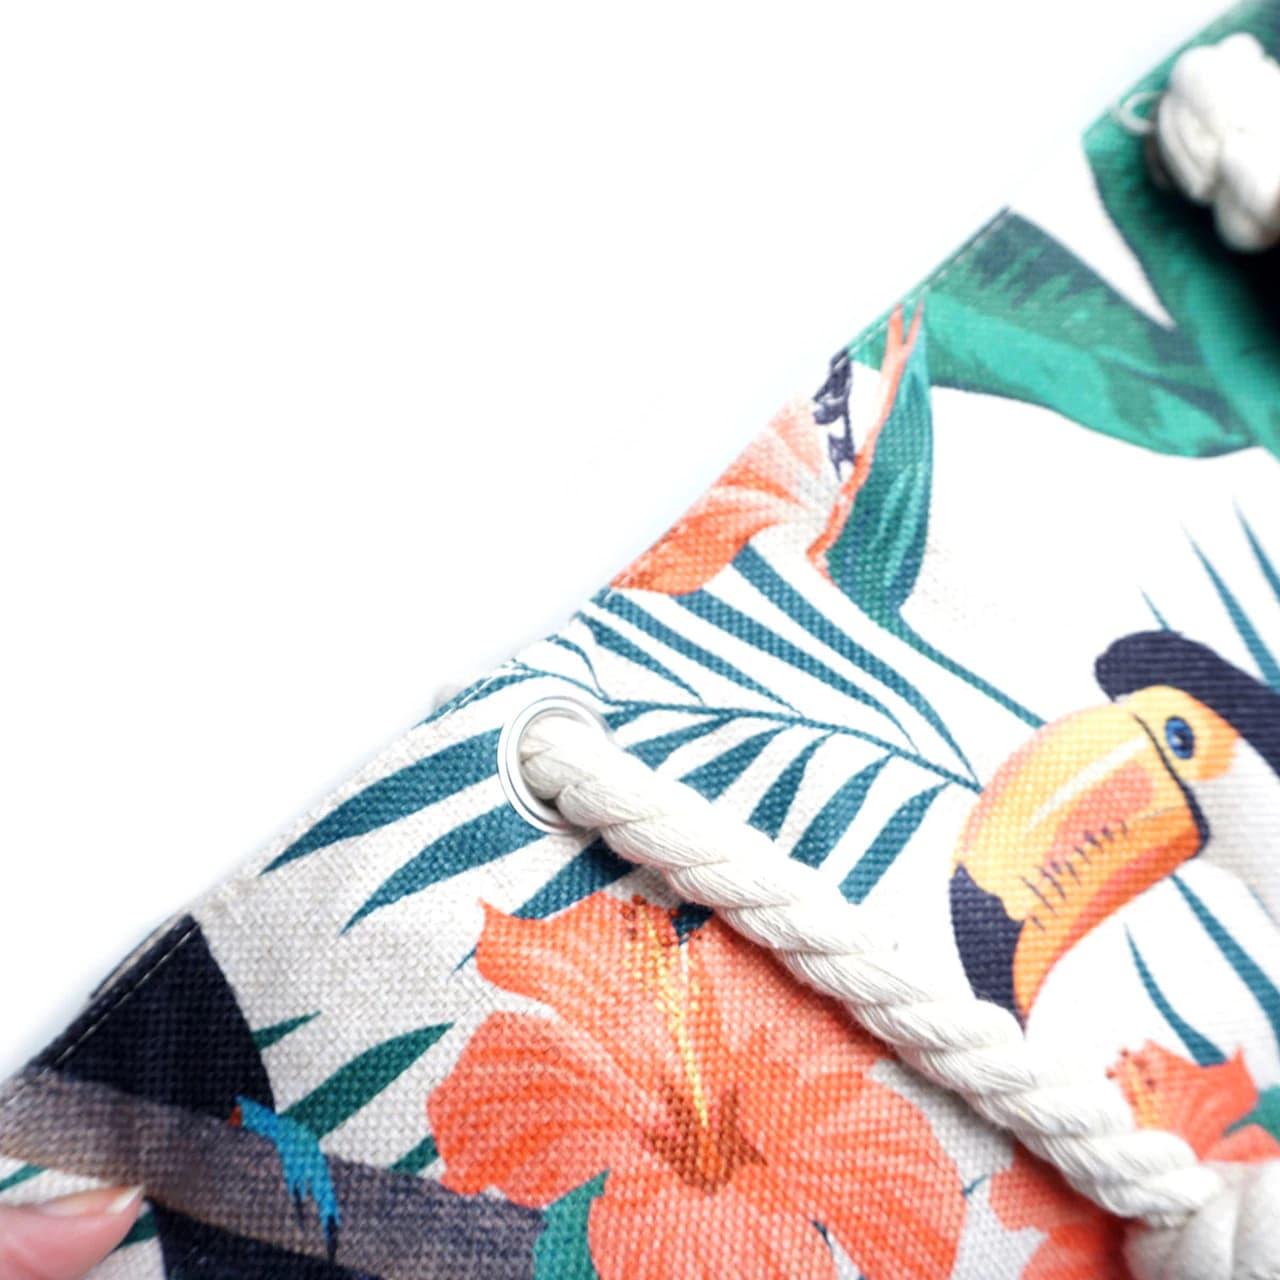 Toucan Tropical Tote Beach Bag - Light Beige - Detail